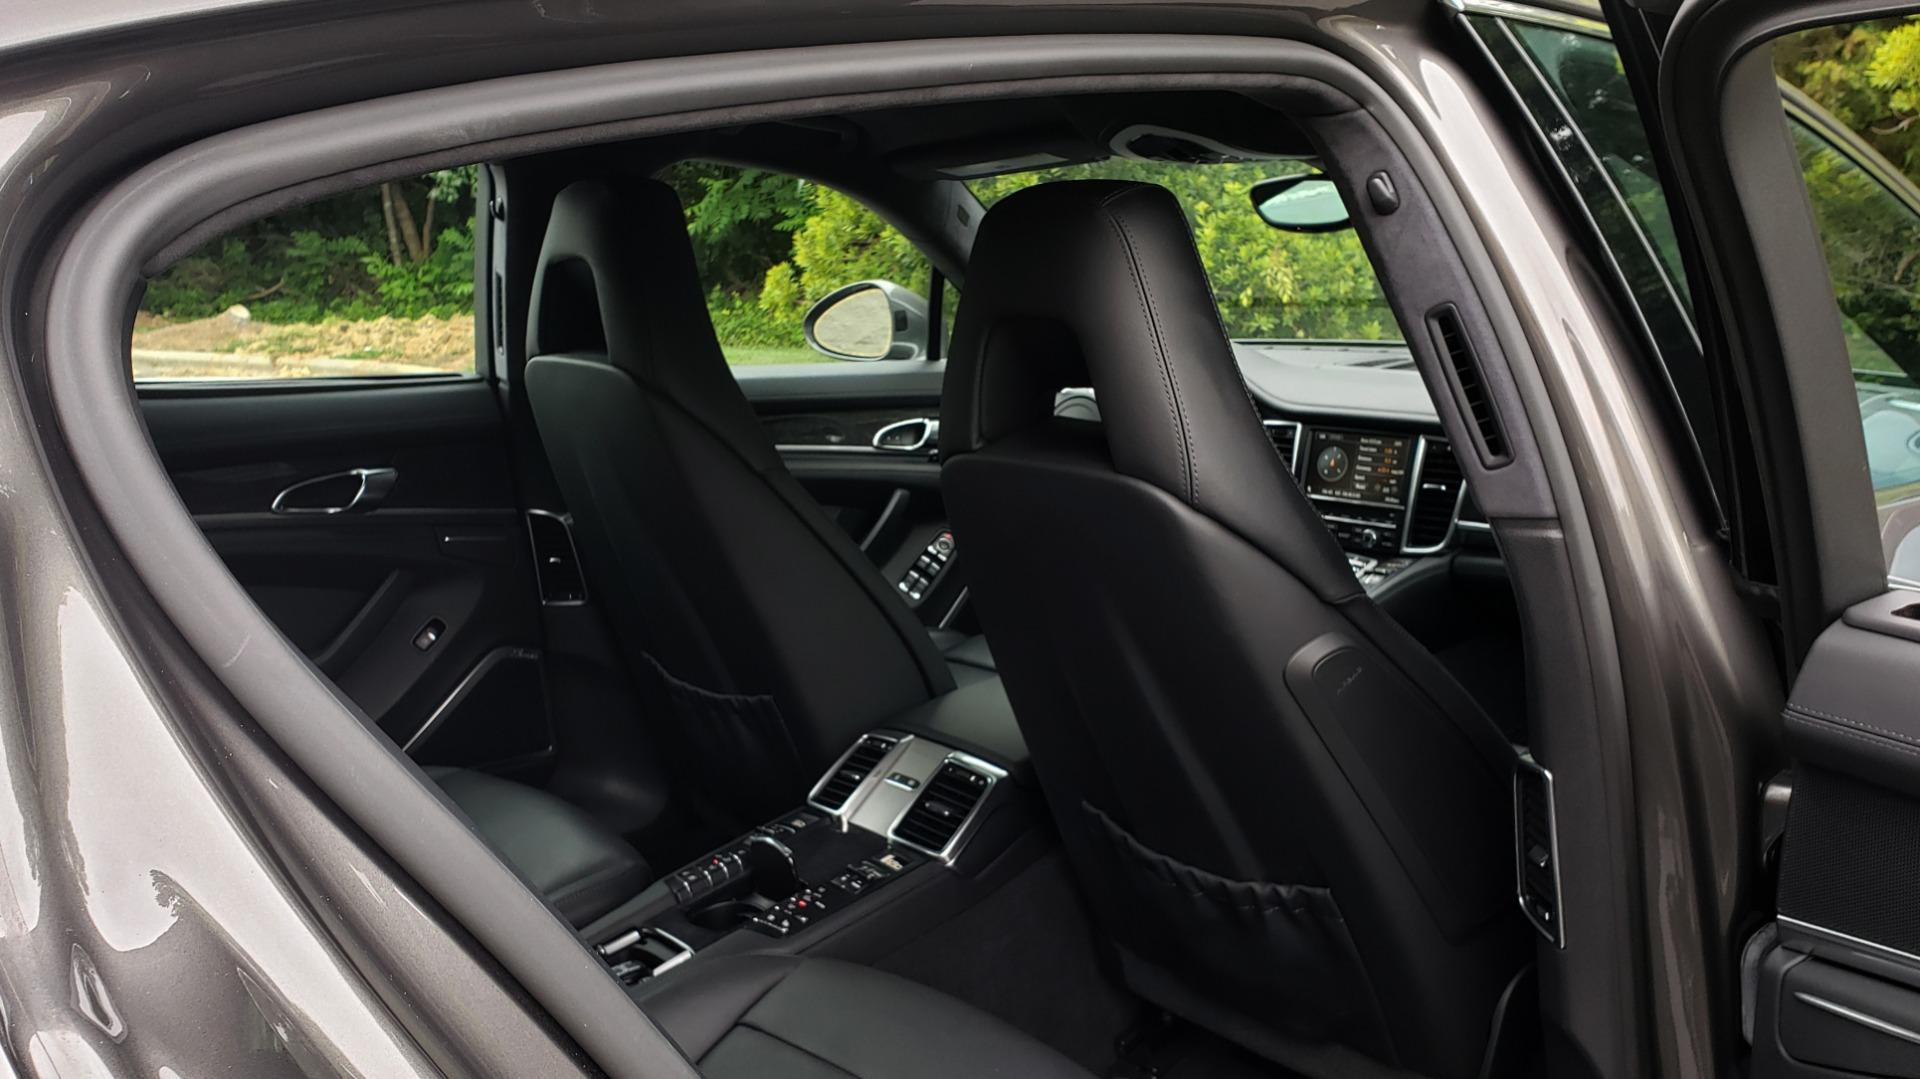 Used 2013 Porsche PANAMERA TURBO 4.8L V8 / AWD / NAV / SUNROOF / LCA / PARK ASST / BURMESTER for sale $45,995 at Formula Imports in Charlotte NC 28227 82